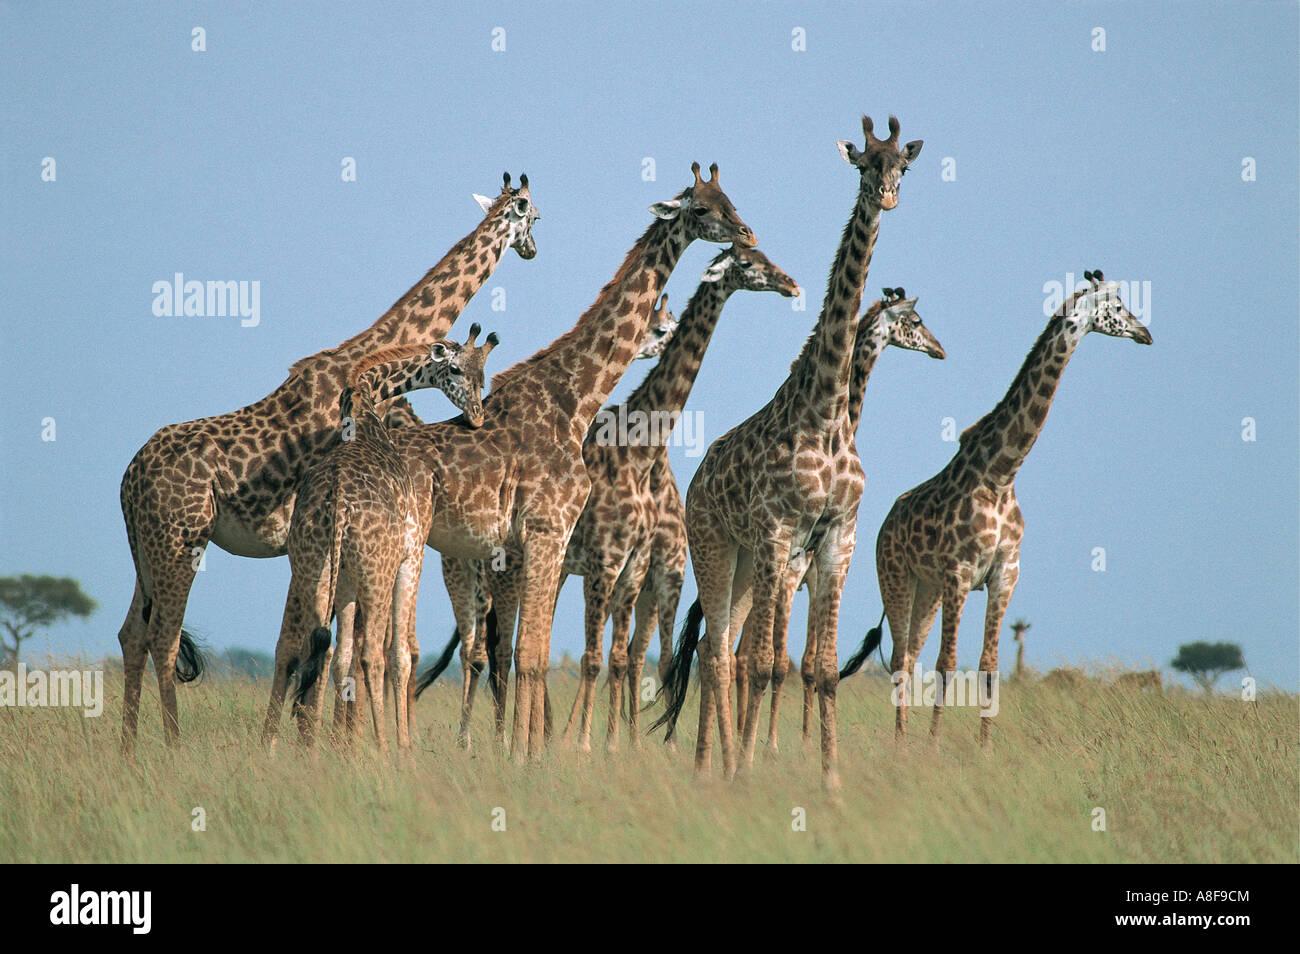 Herd of Masai Giraffe Masai Mara National Reserve Kenya - Stock Image